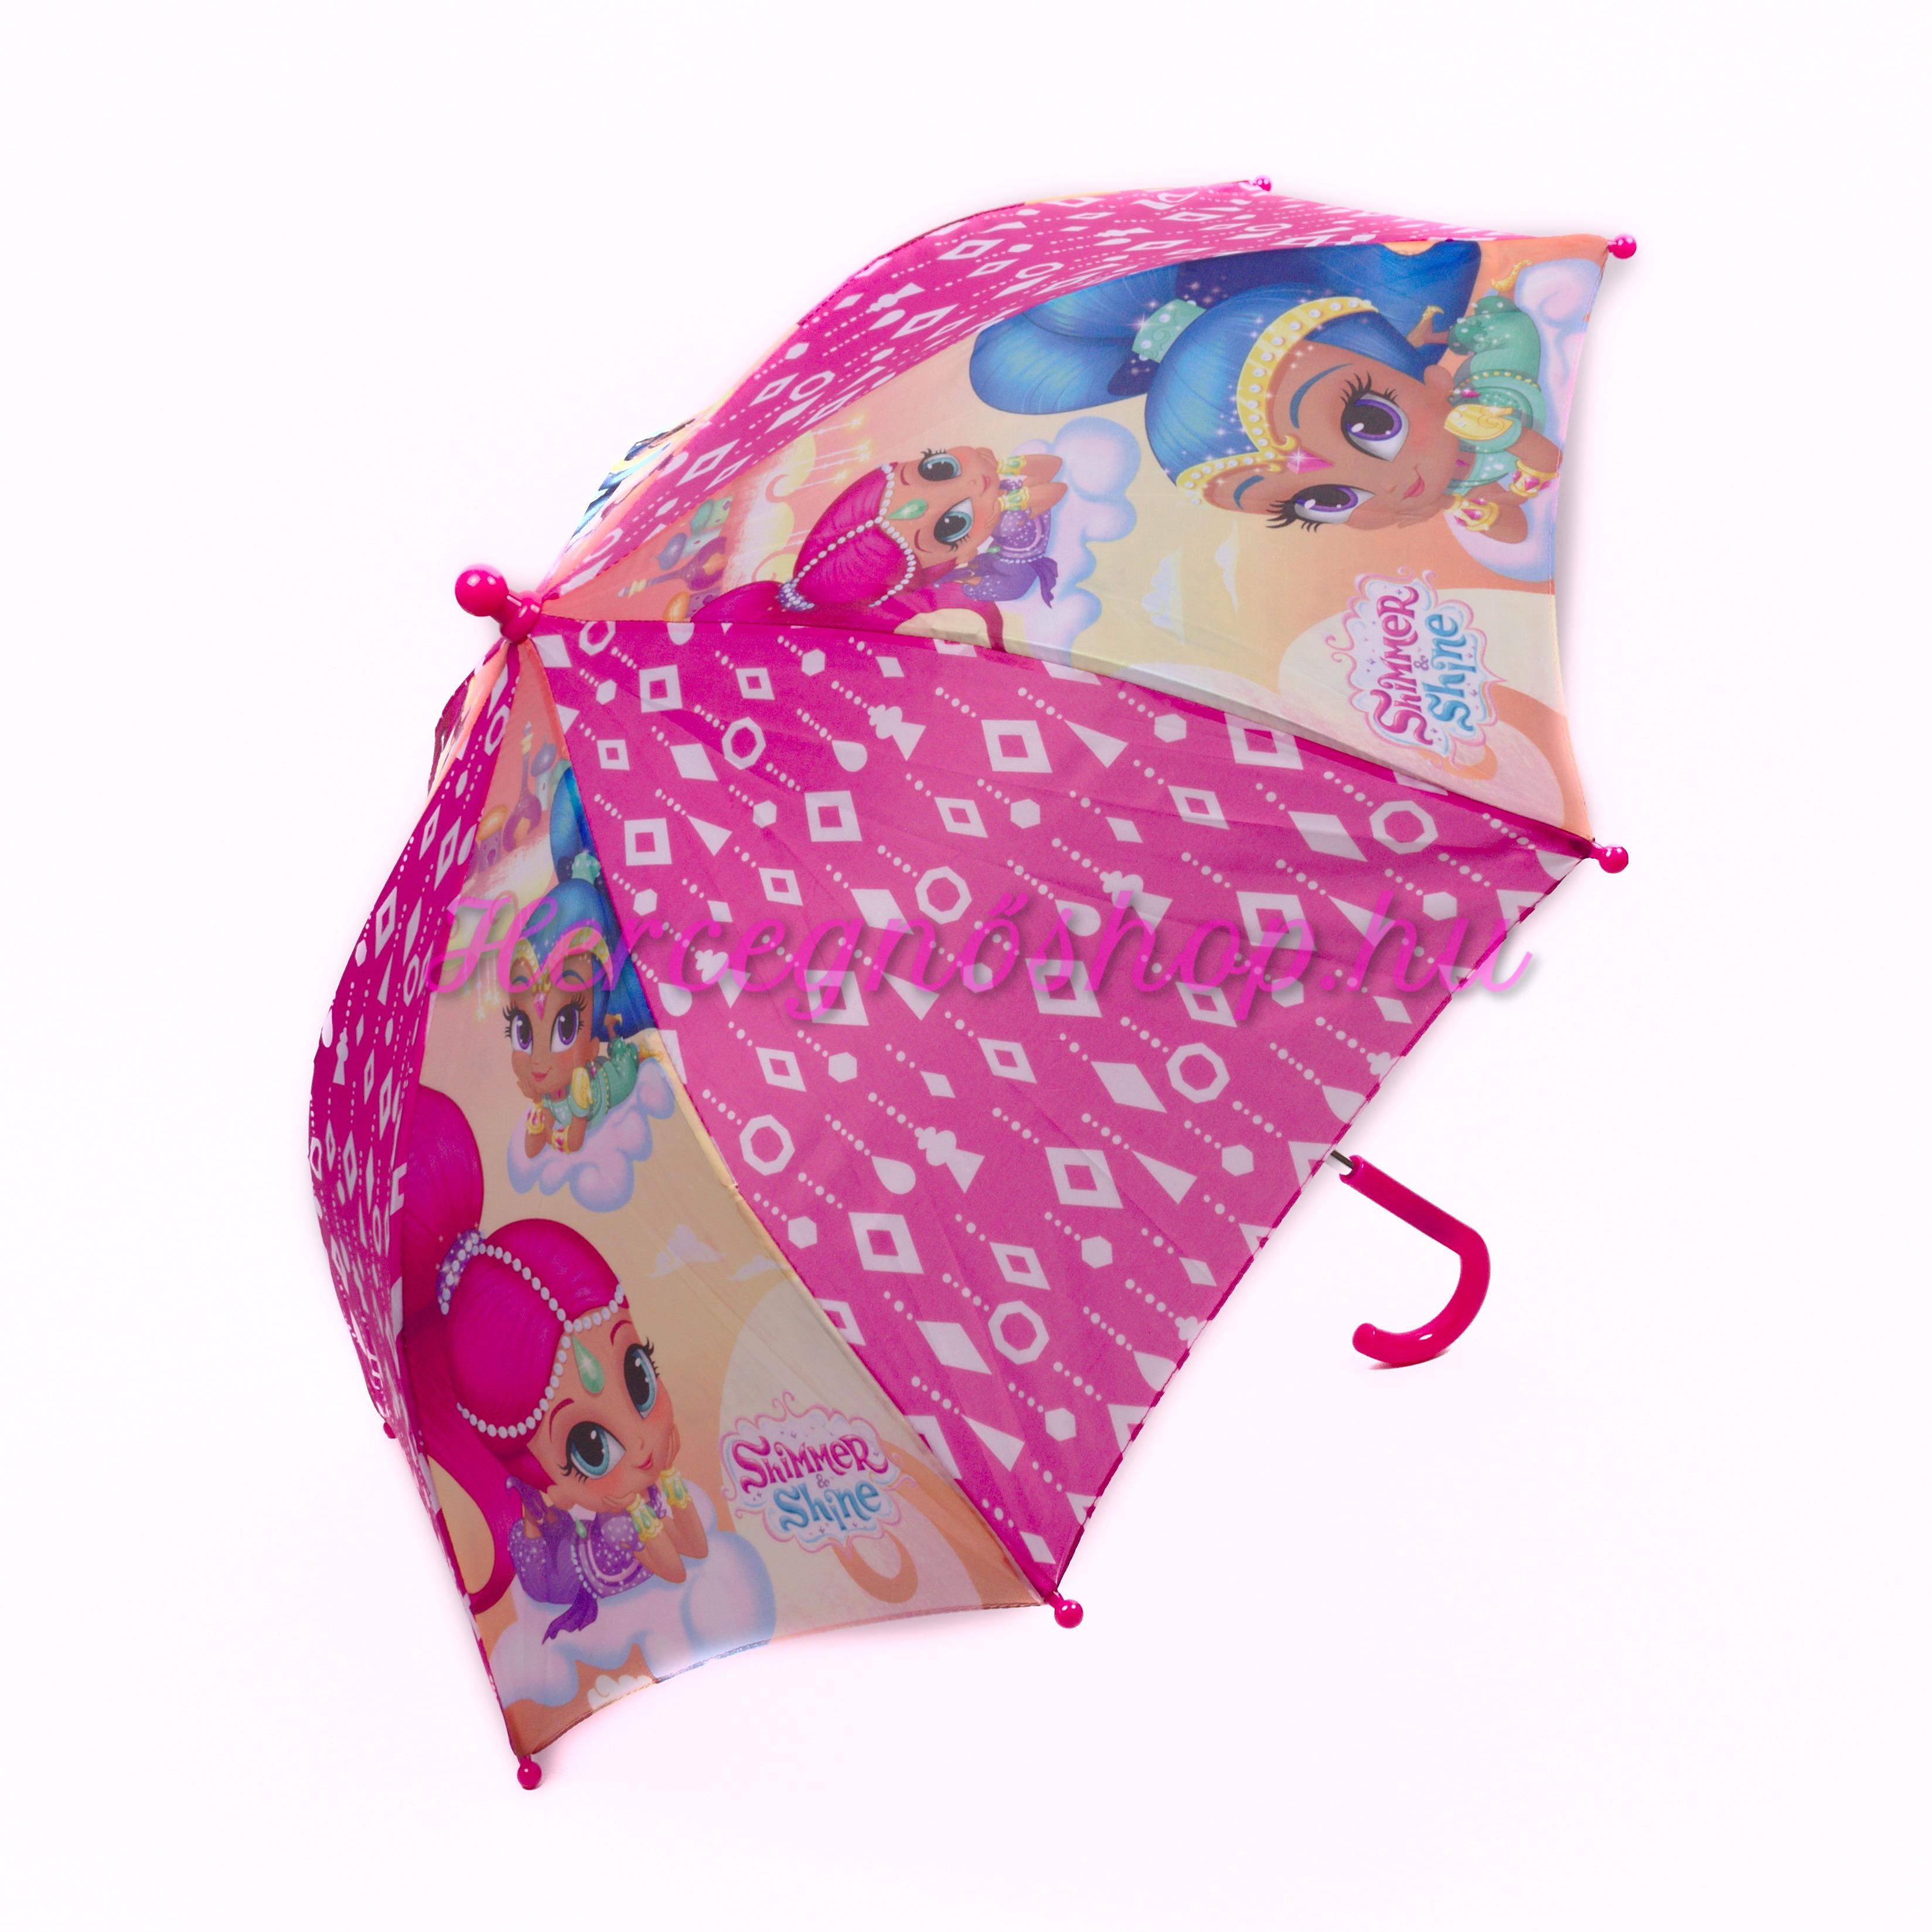 Shimmer és Shine esernyő (Shimmer and Shine)